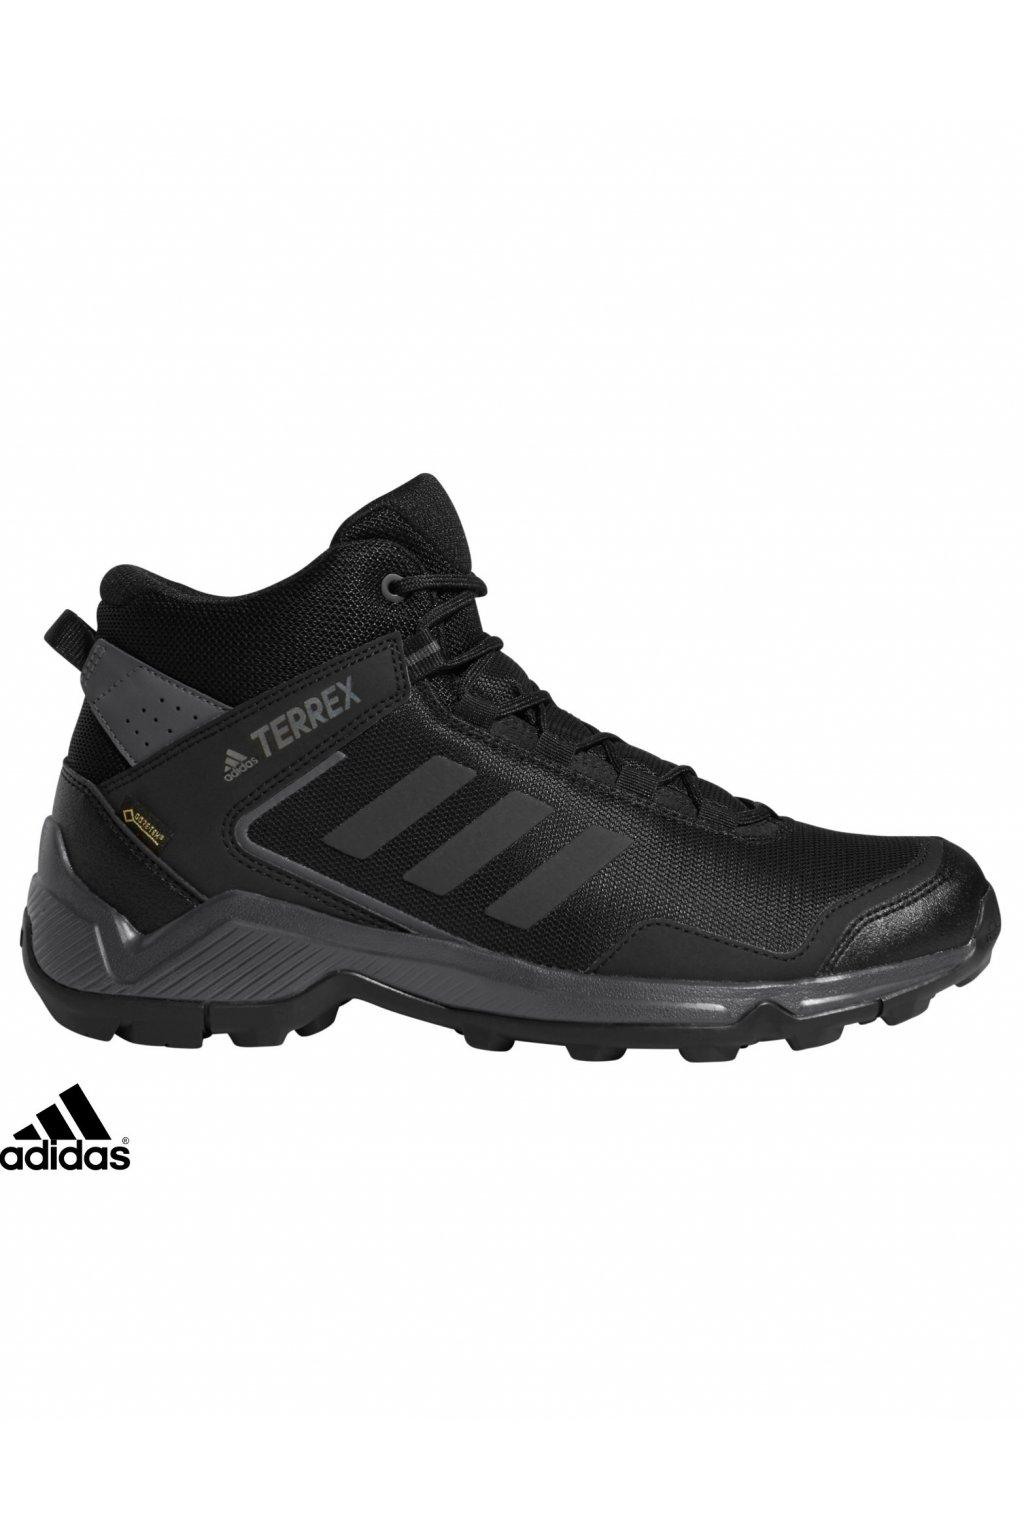 f36760 panske outdoorove topanky adidas terrex eastrail mid gtx